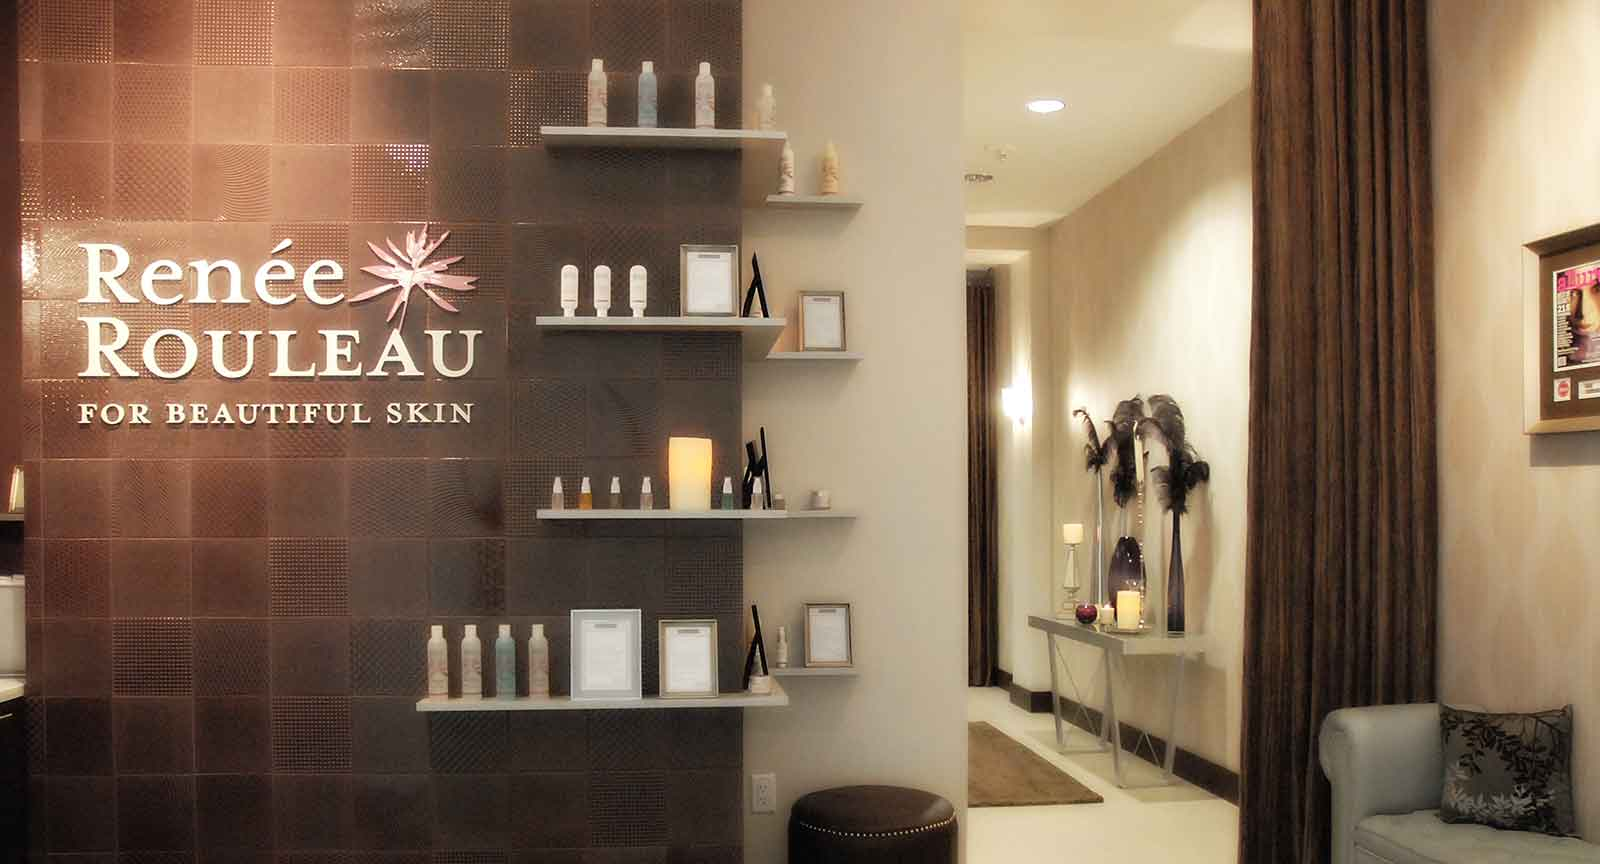 Renee Rouleau Skin Care Spa